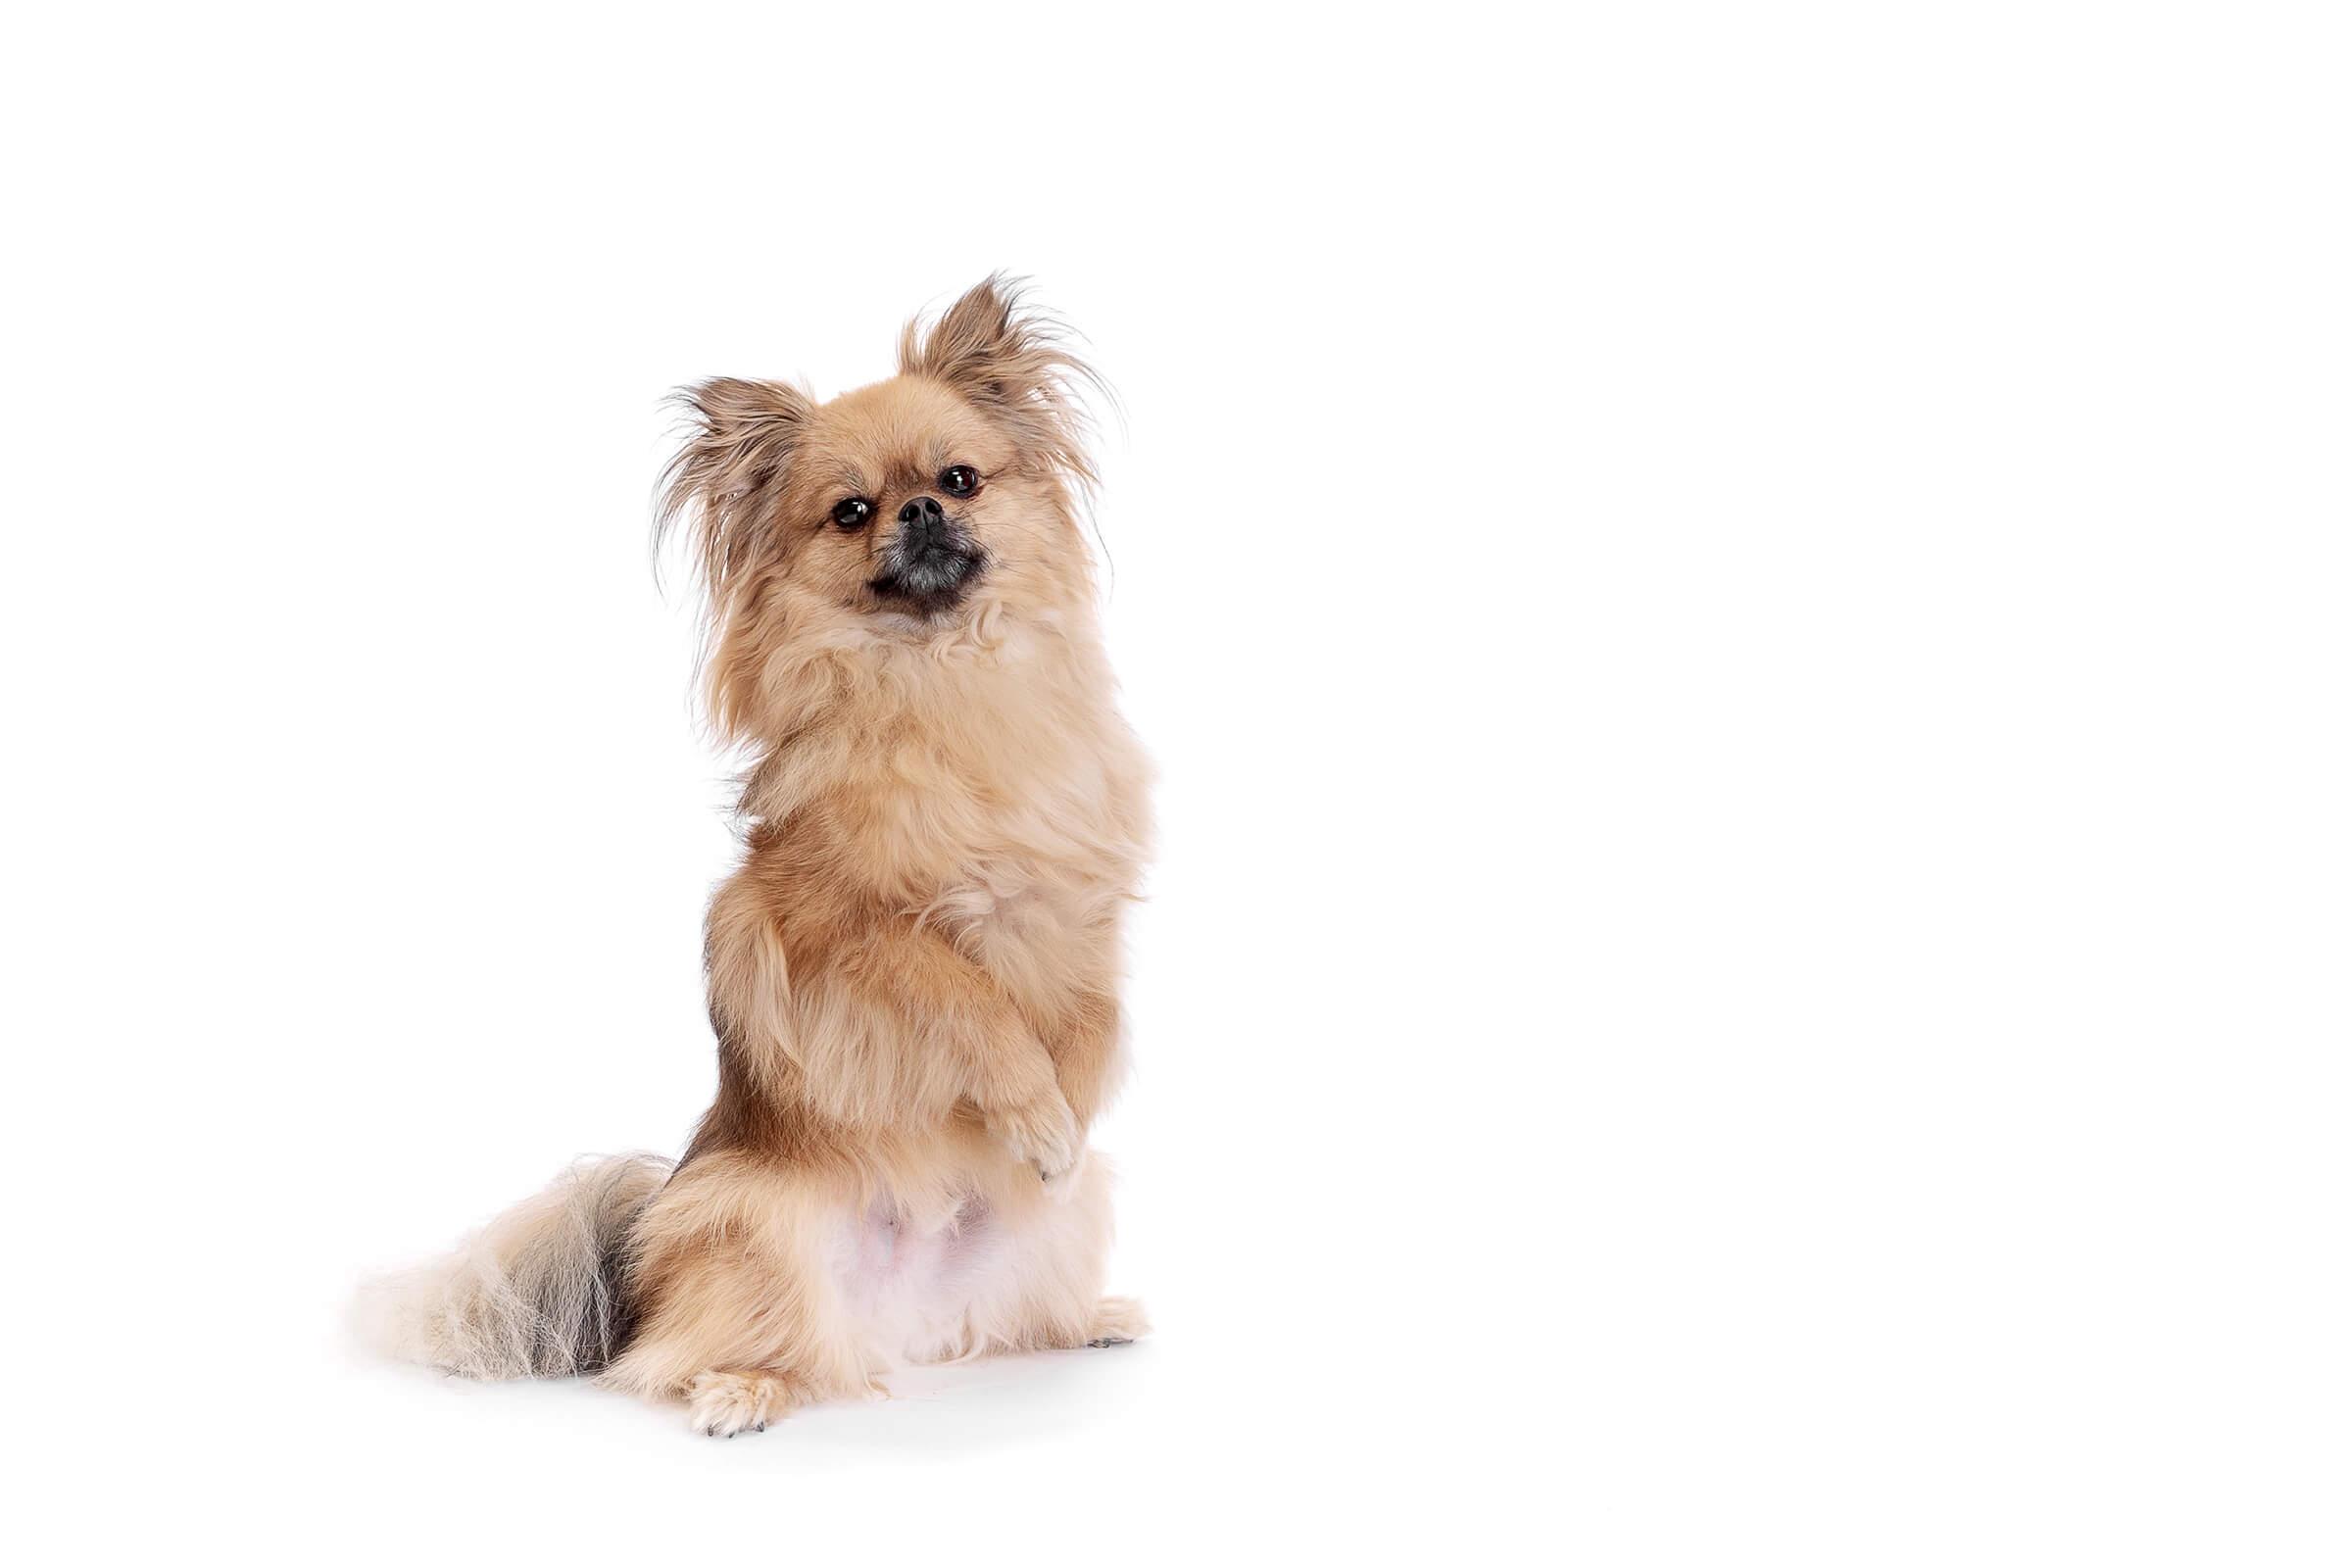 begging dog on white background